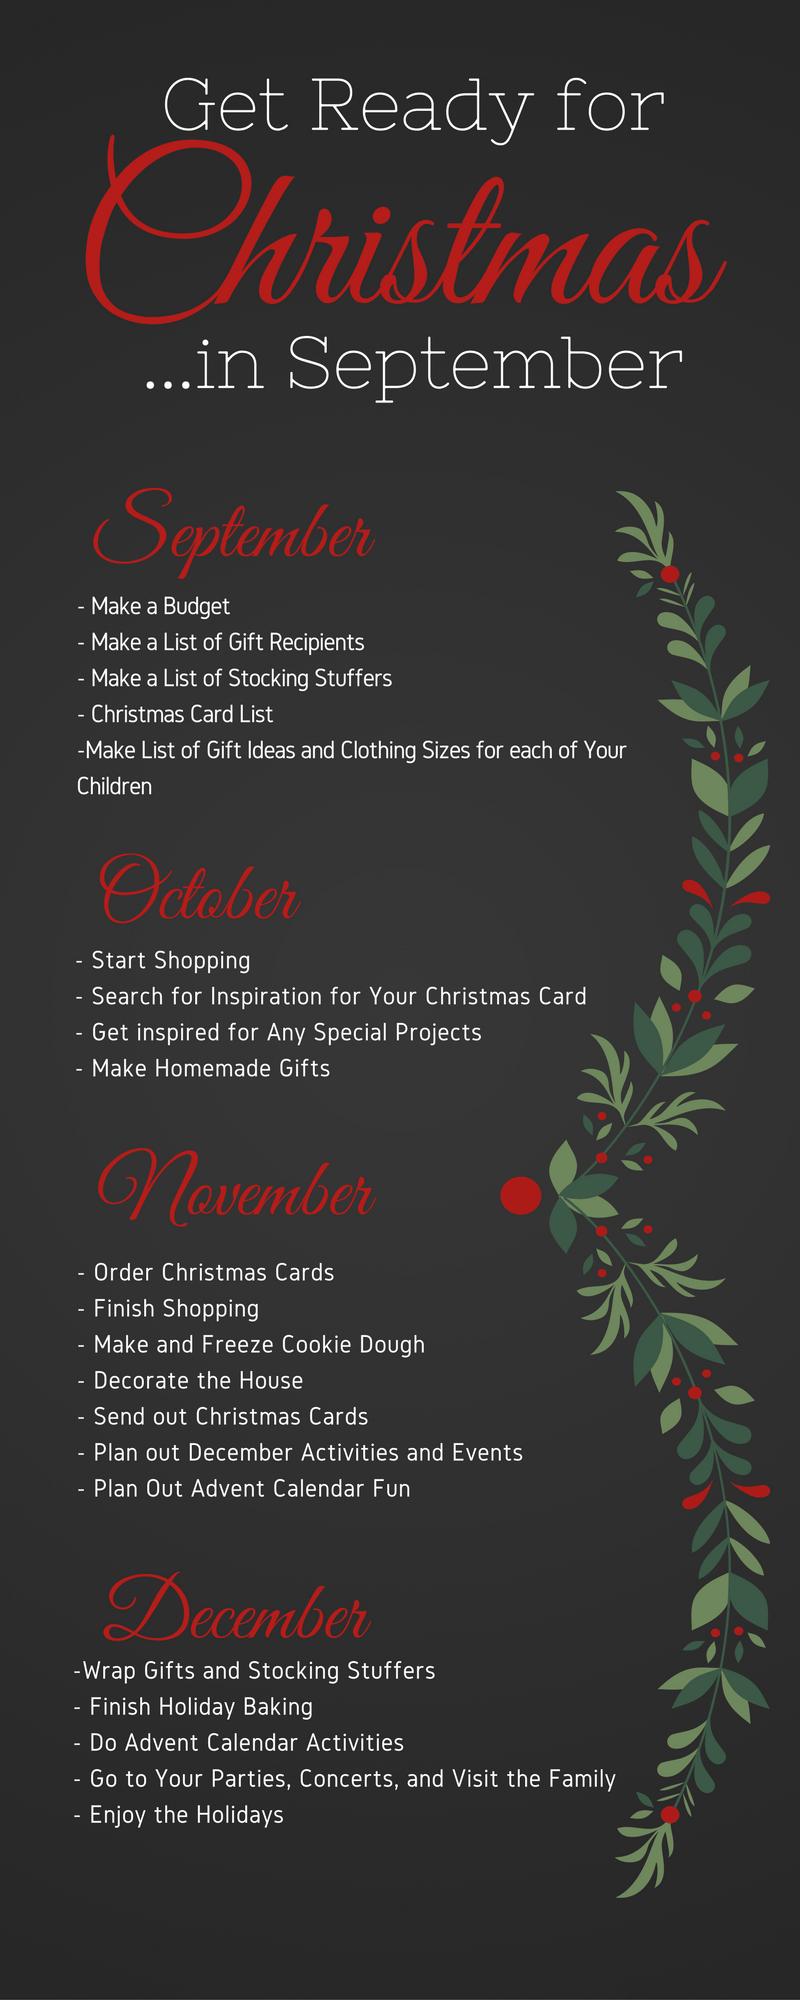 Get Ready For Christmas September Christmas Diy